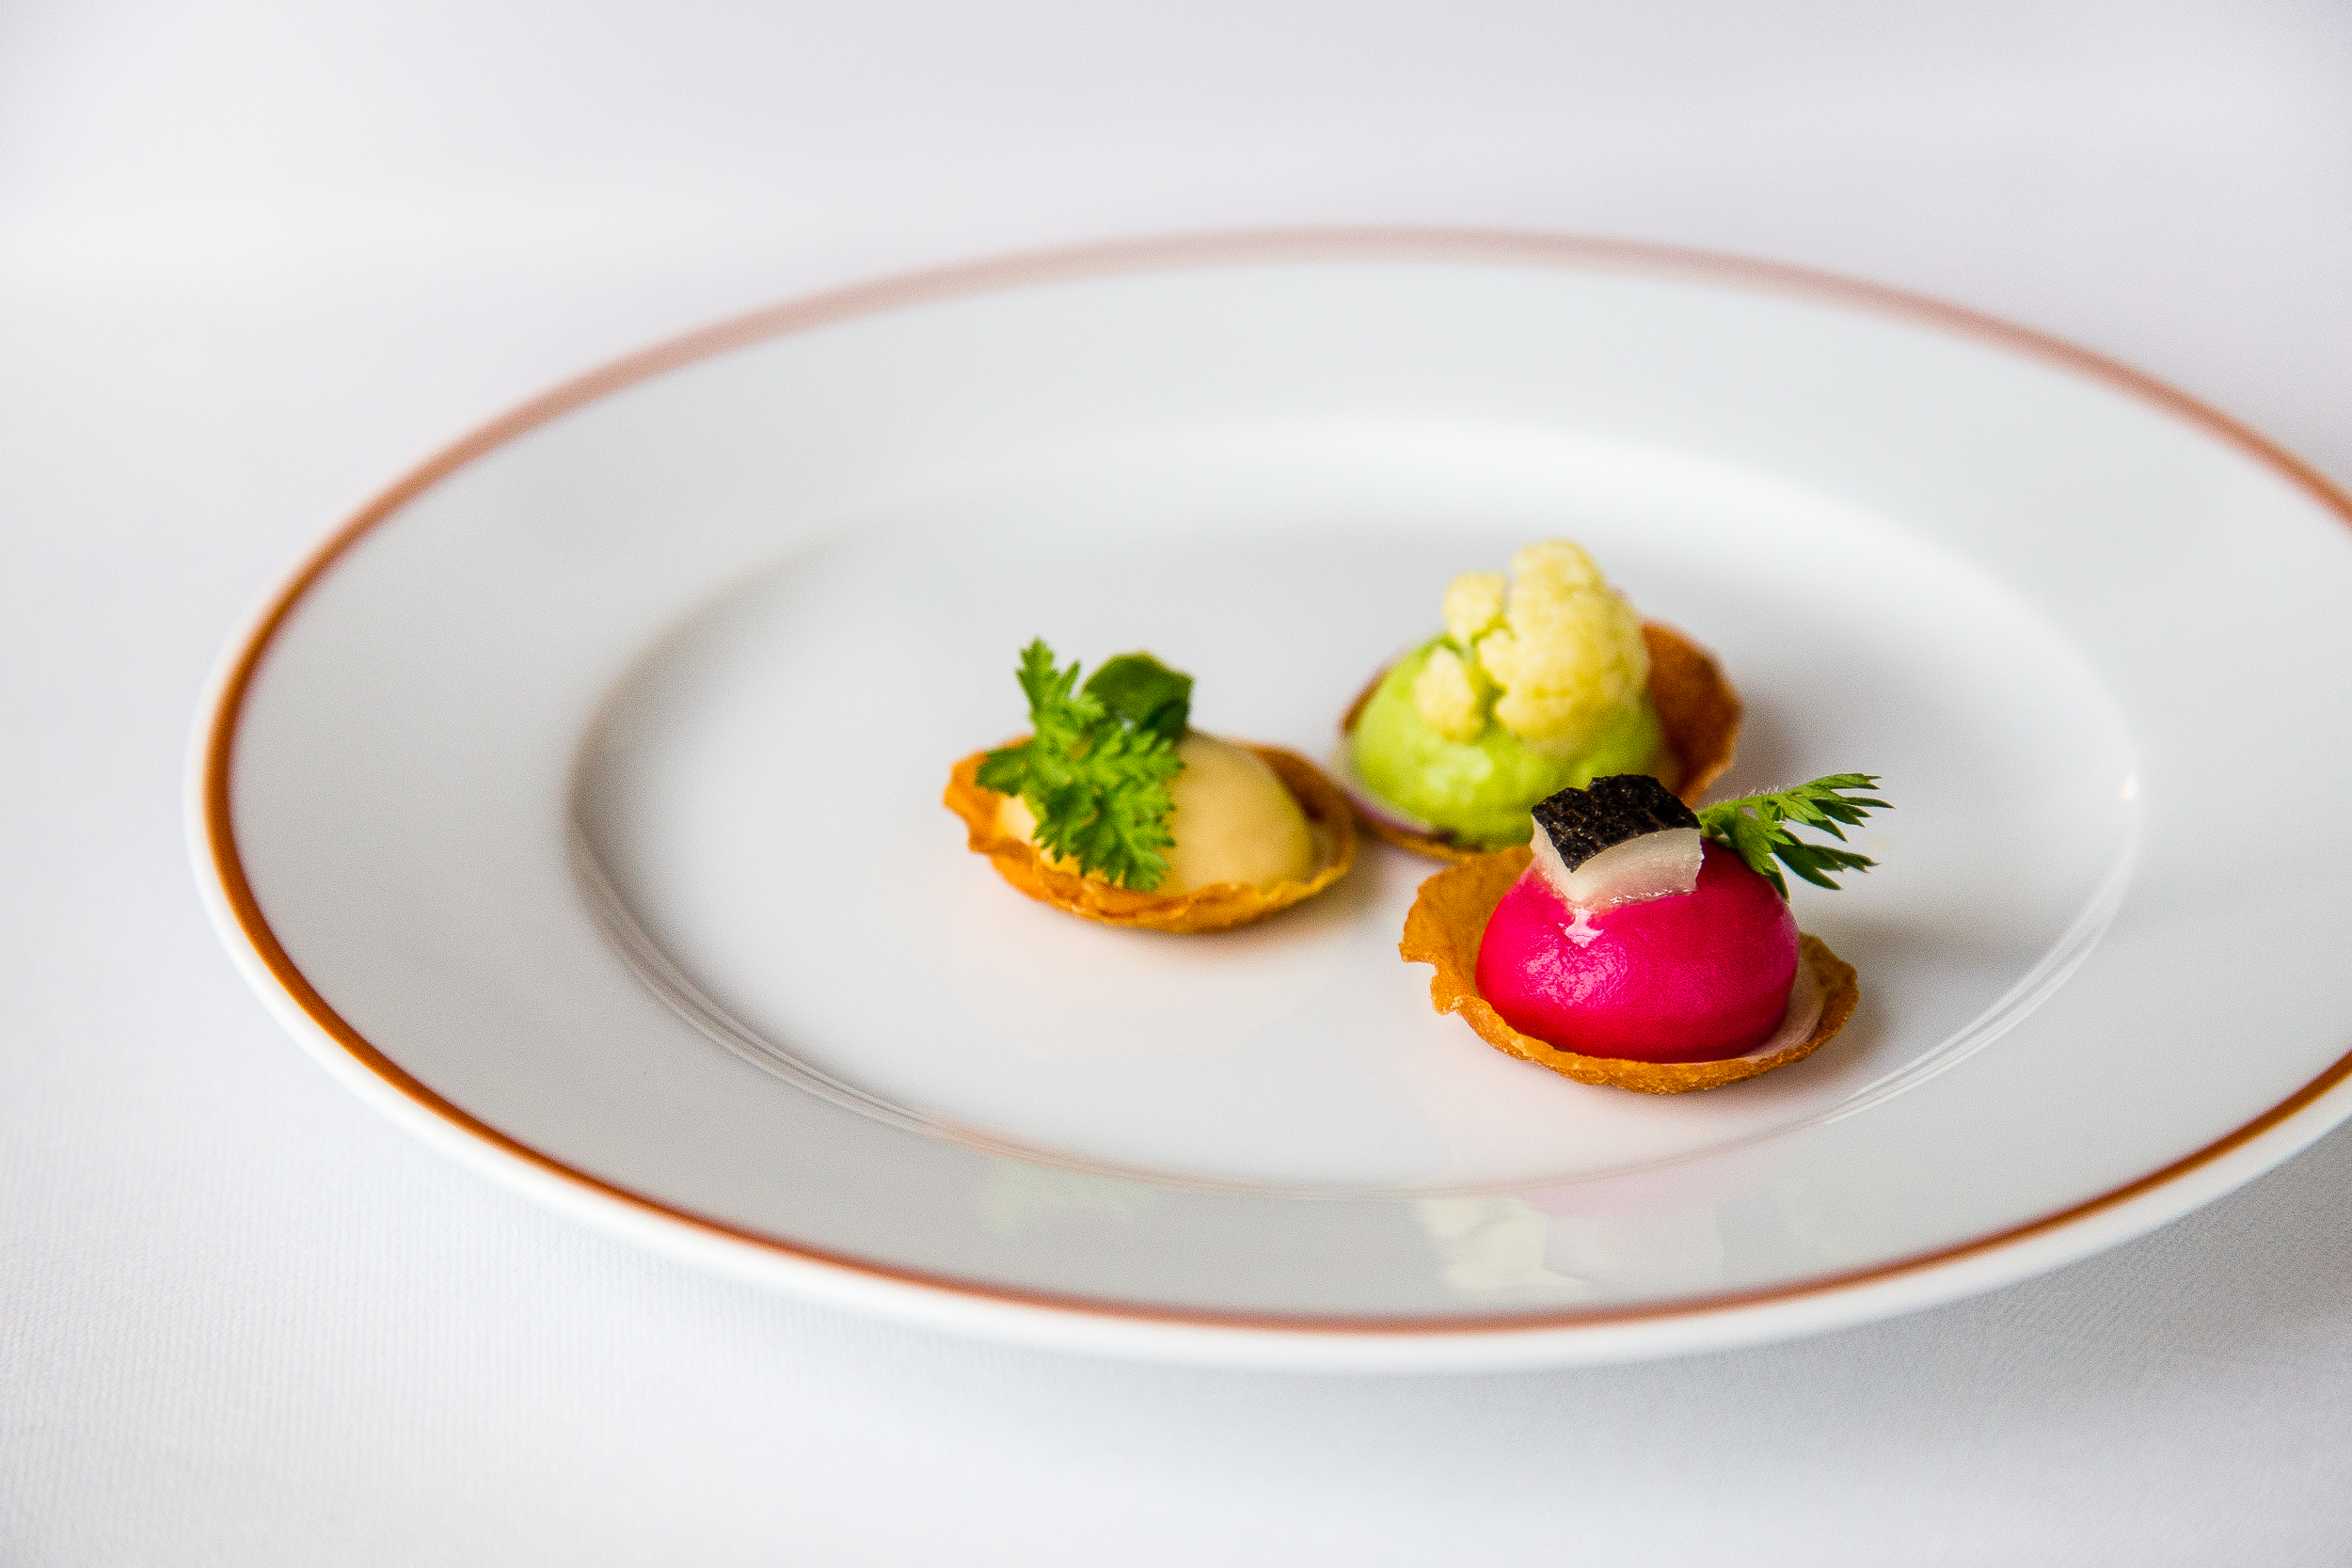 Tartelets: Beet and Lamon, Broccoli, Apple and Turnip